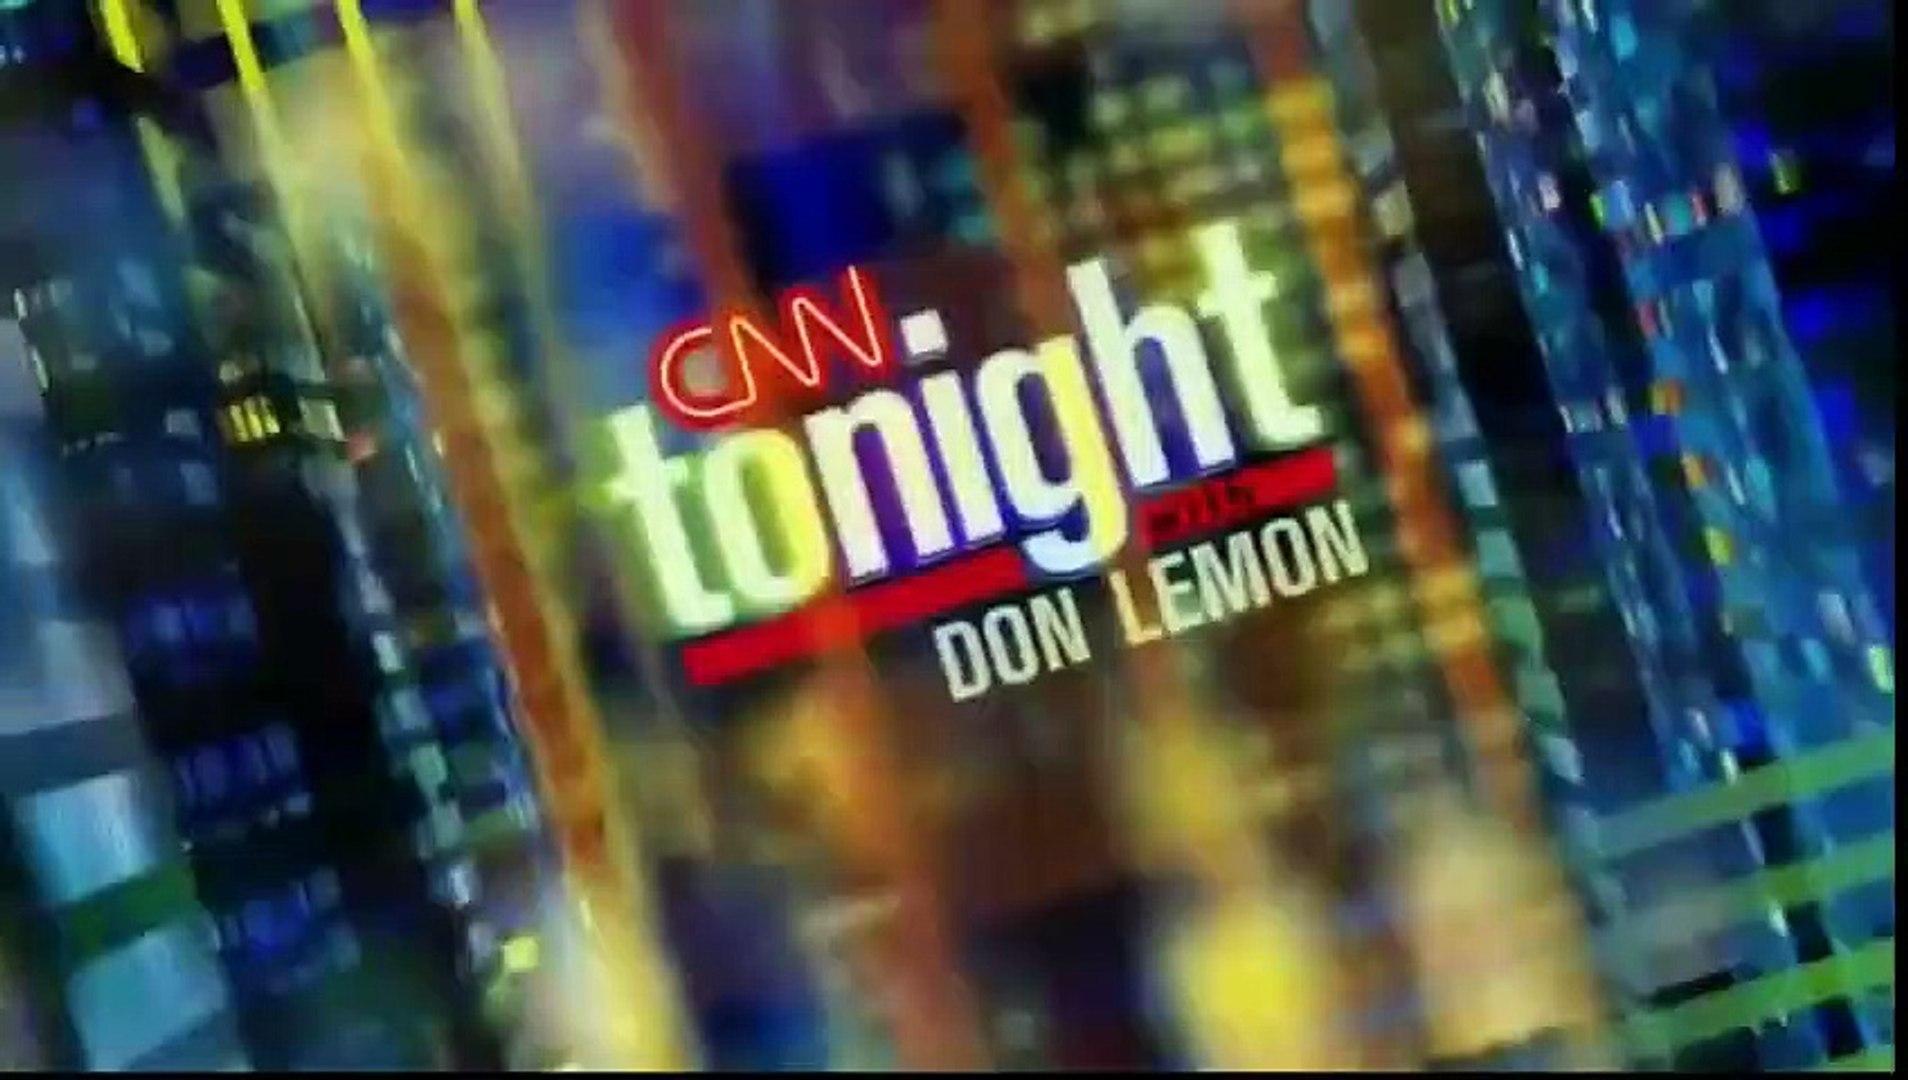 CNN Tonight Don Lemon [10PM] 4-25-2019- Trump's Breaking news Today